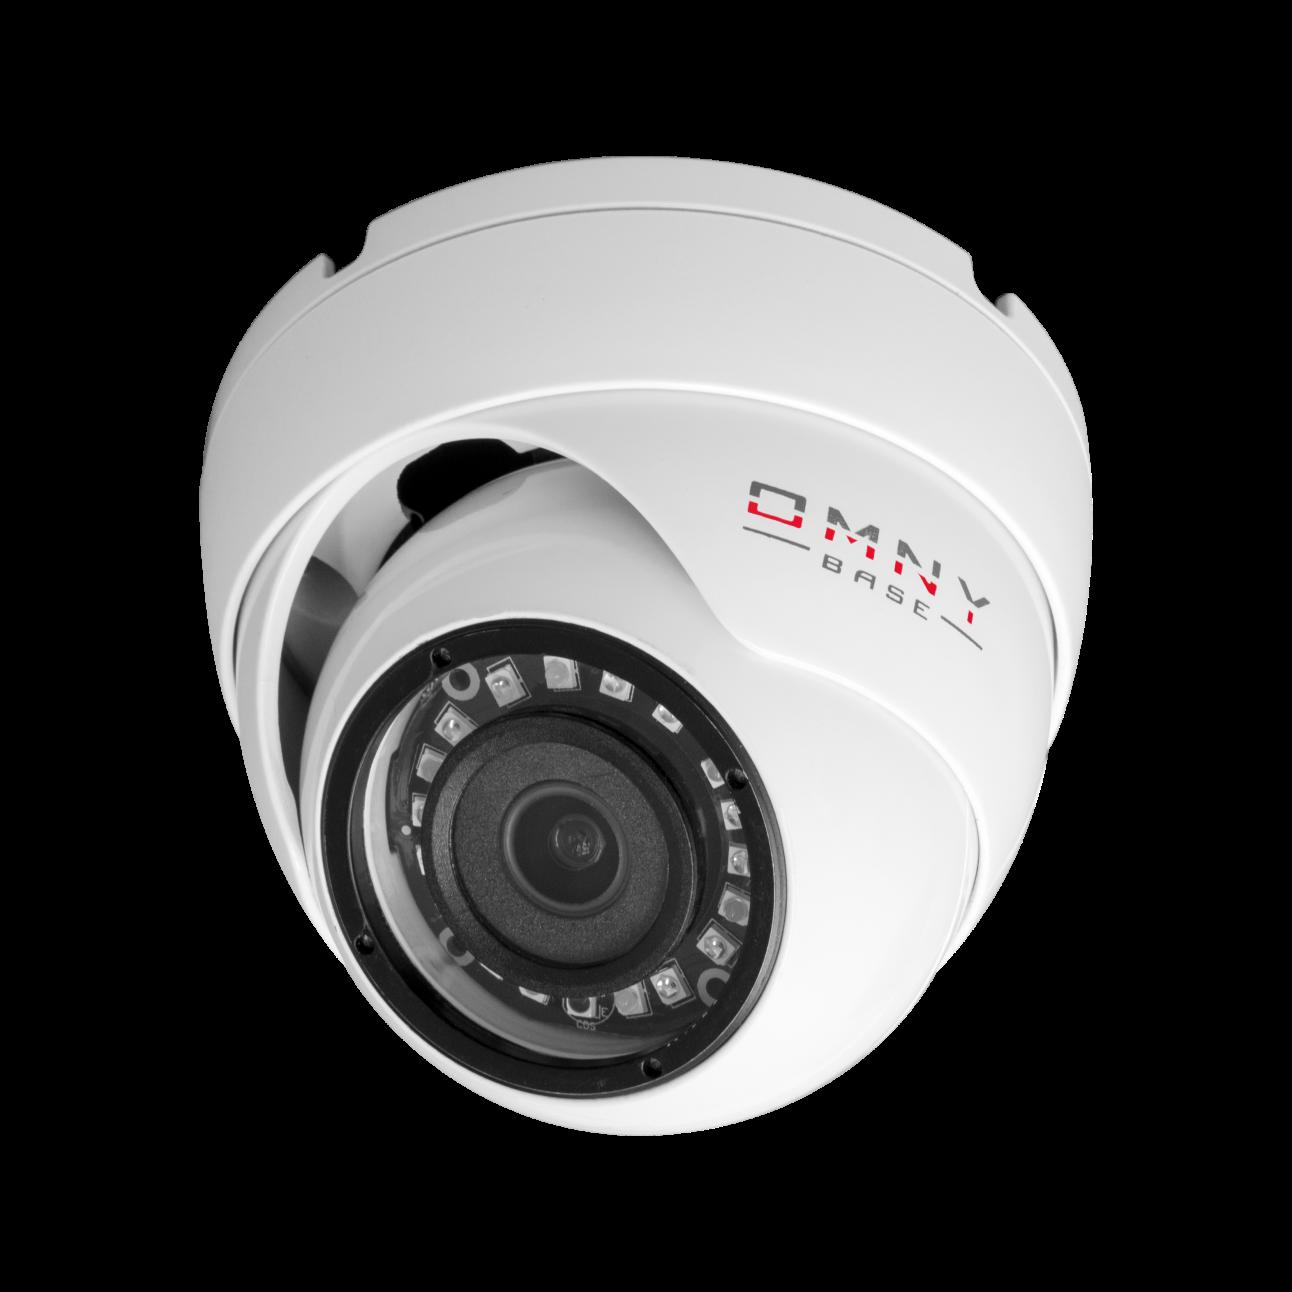 IP камера OMNY BASE miniDome2E-WD-12V 28, купольная 2Мп (1920×1080) 30к/с, 2.8мм, F2.0, 12±1В DC, ИК до 25м, EasyMic, WDR 120dB